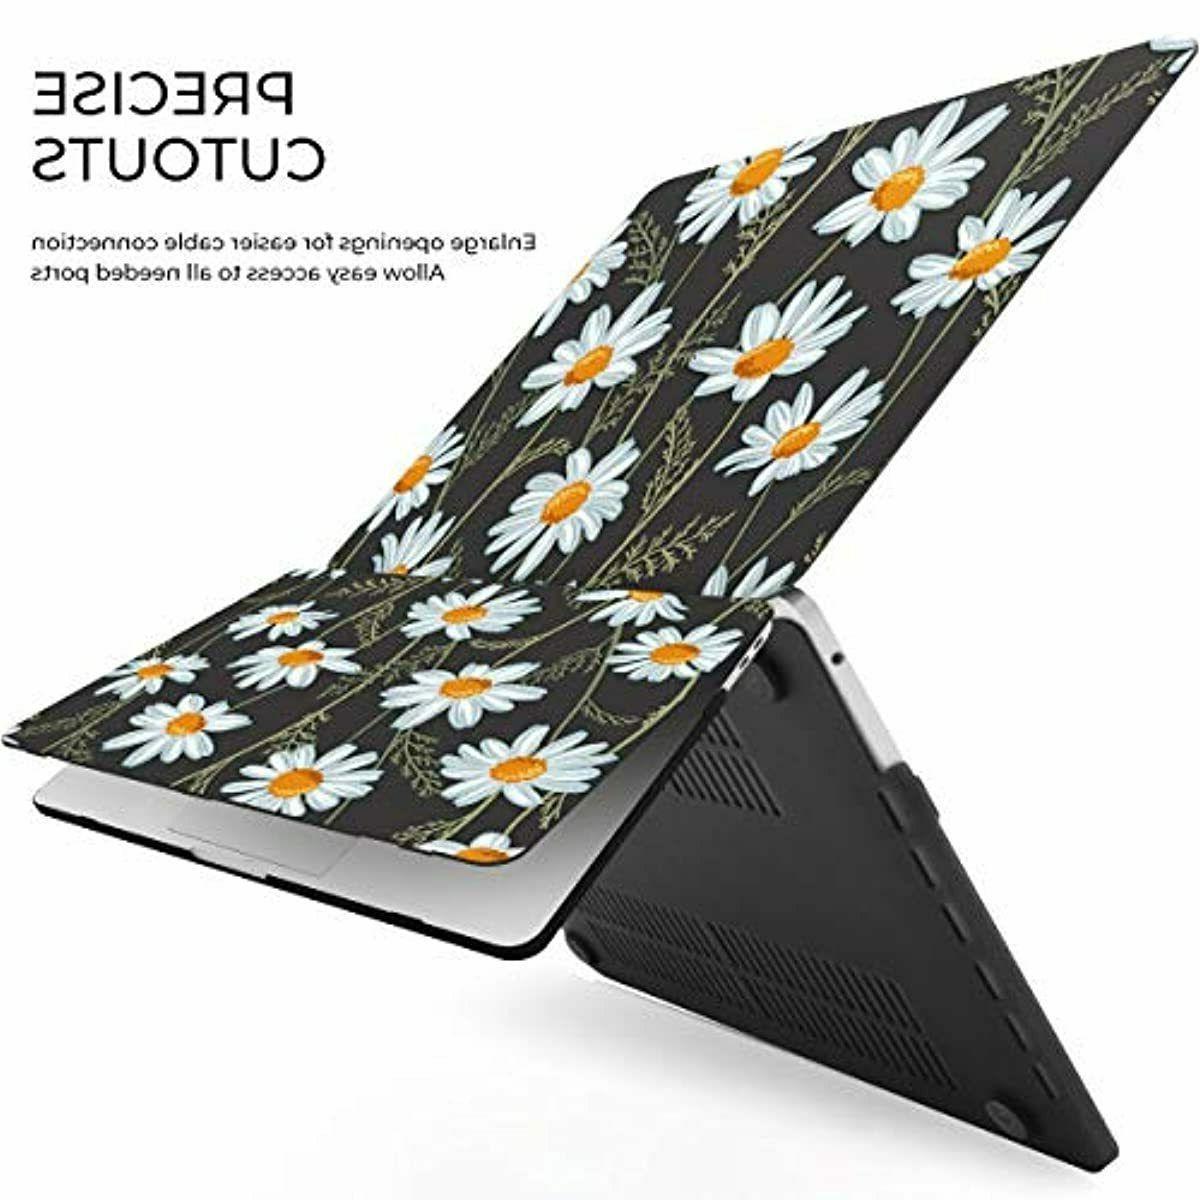 OneGET MacBook Air Inch Laptop Case MacBook Air13 A1932